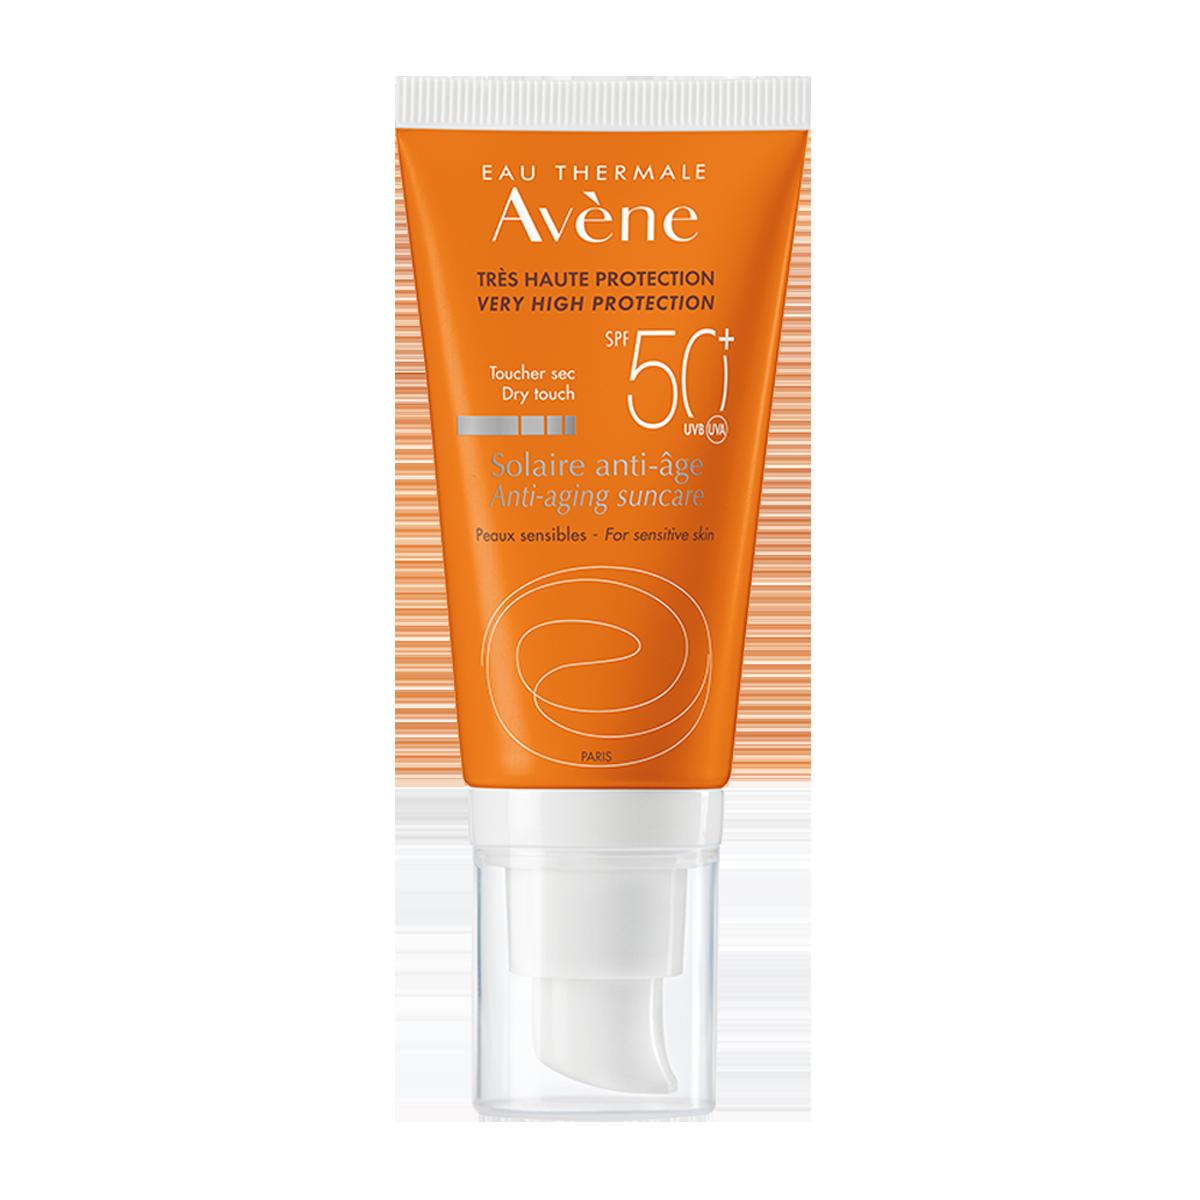 Eau Thermale Avène Sonnenschutz Anti-Aging SPF50+